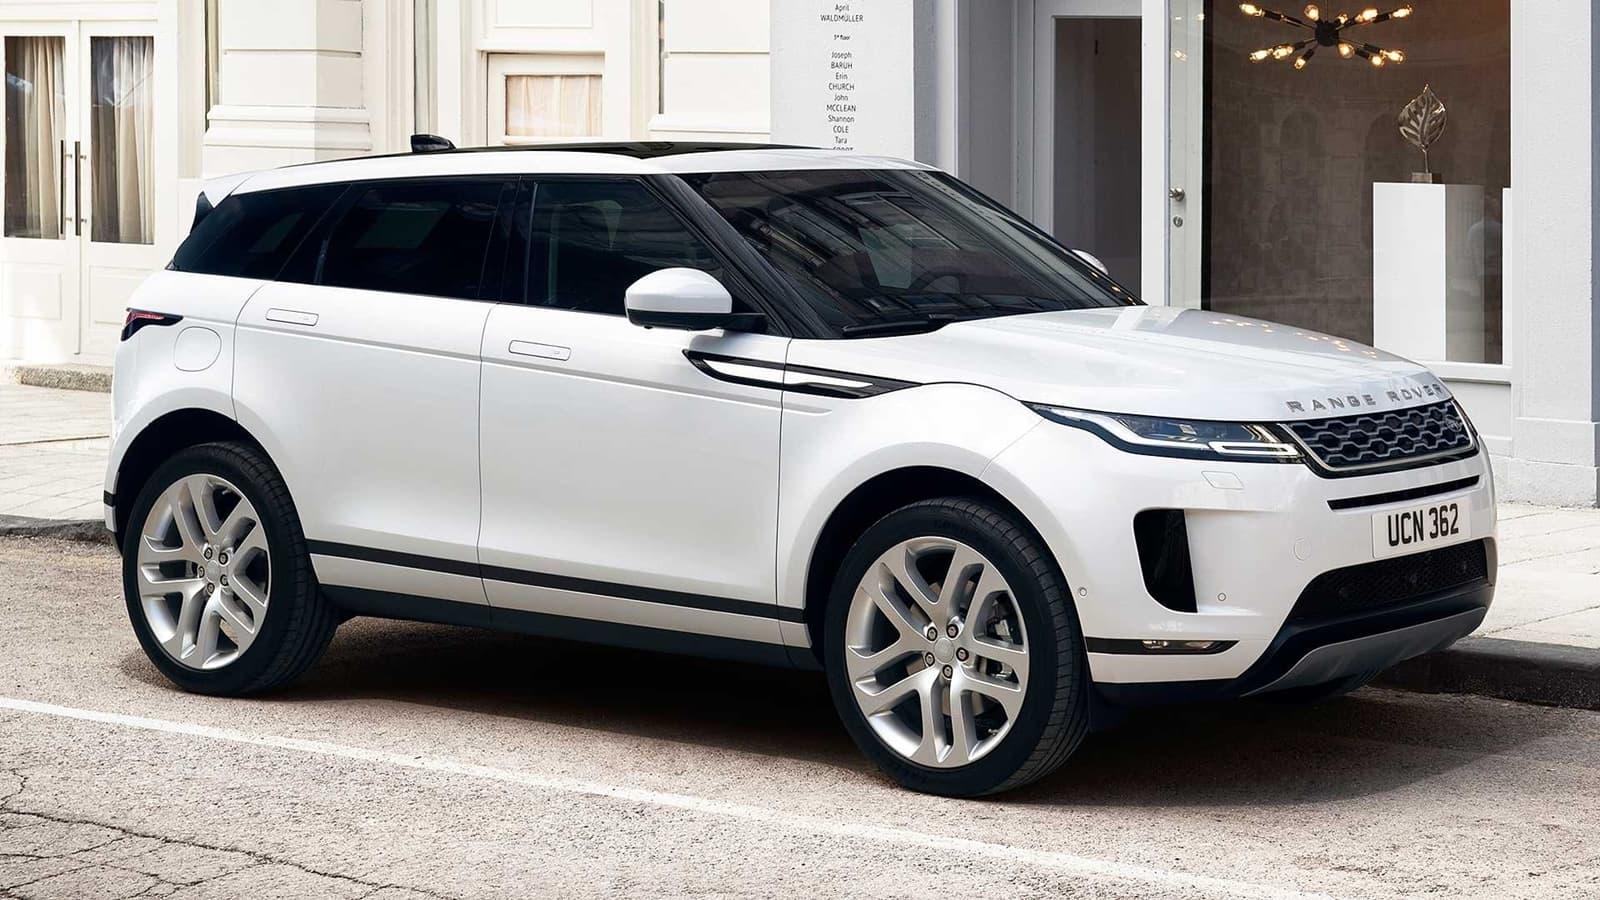 Range Rover Evoque 2019 1118 052